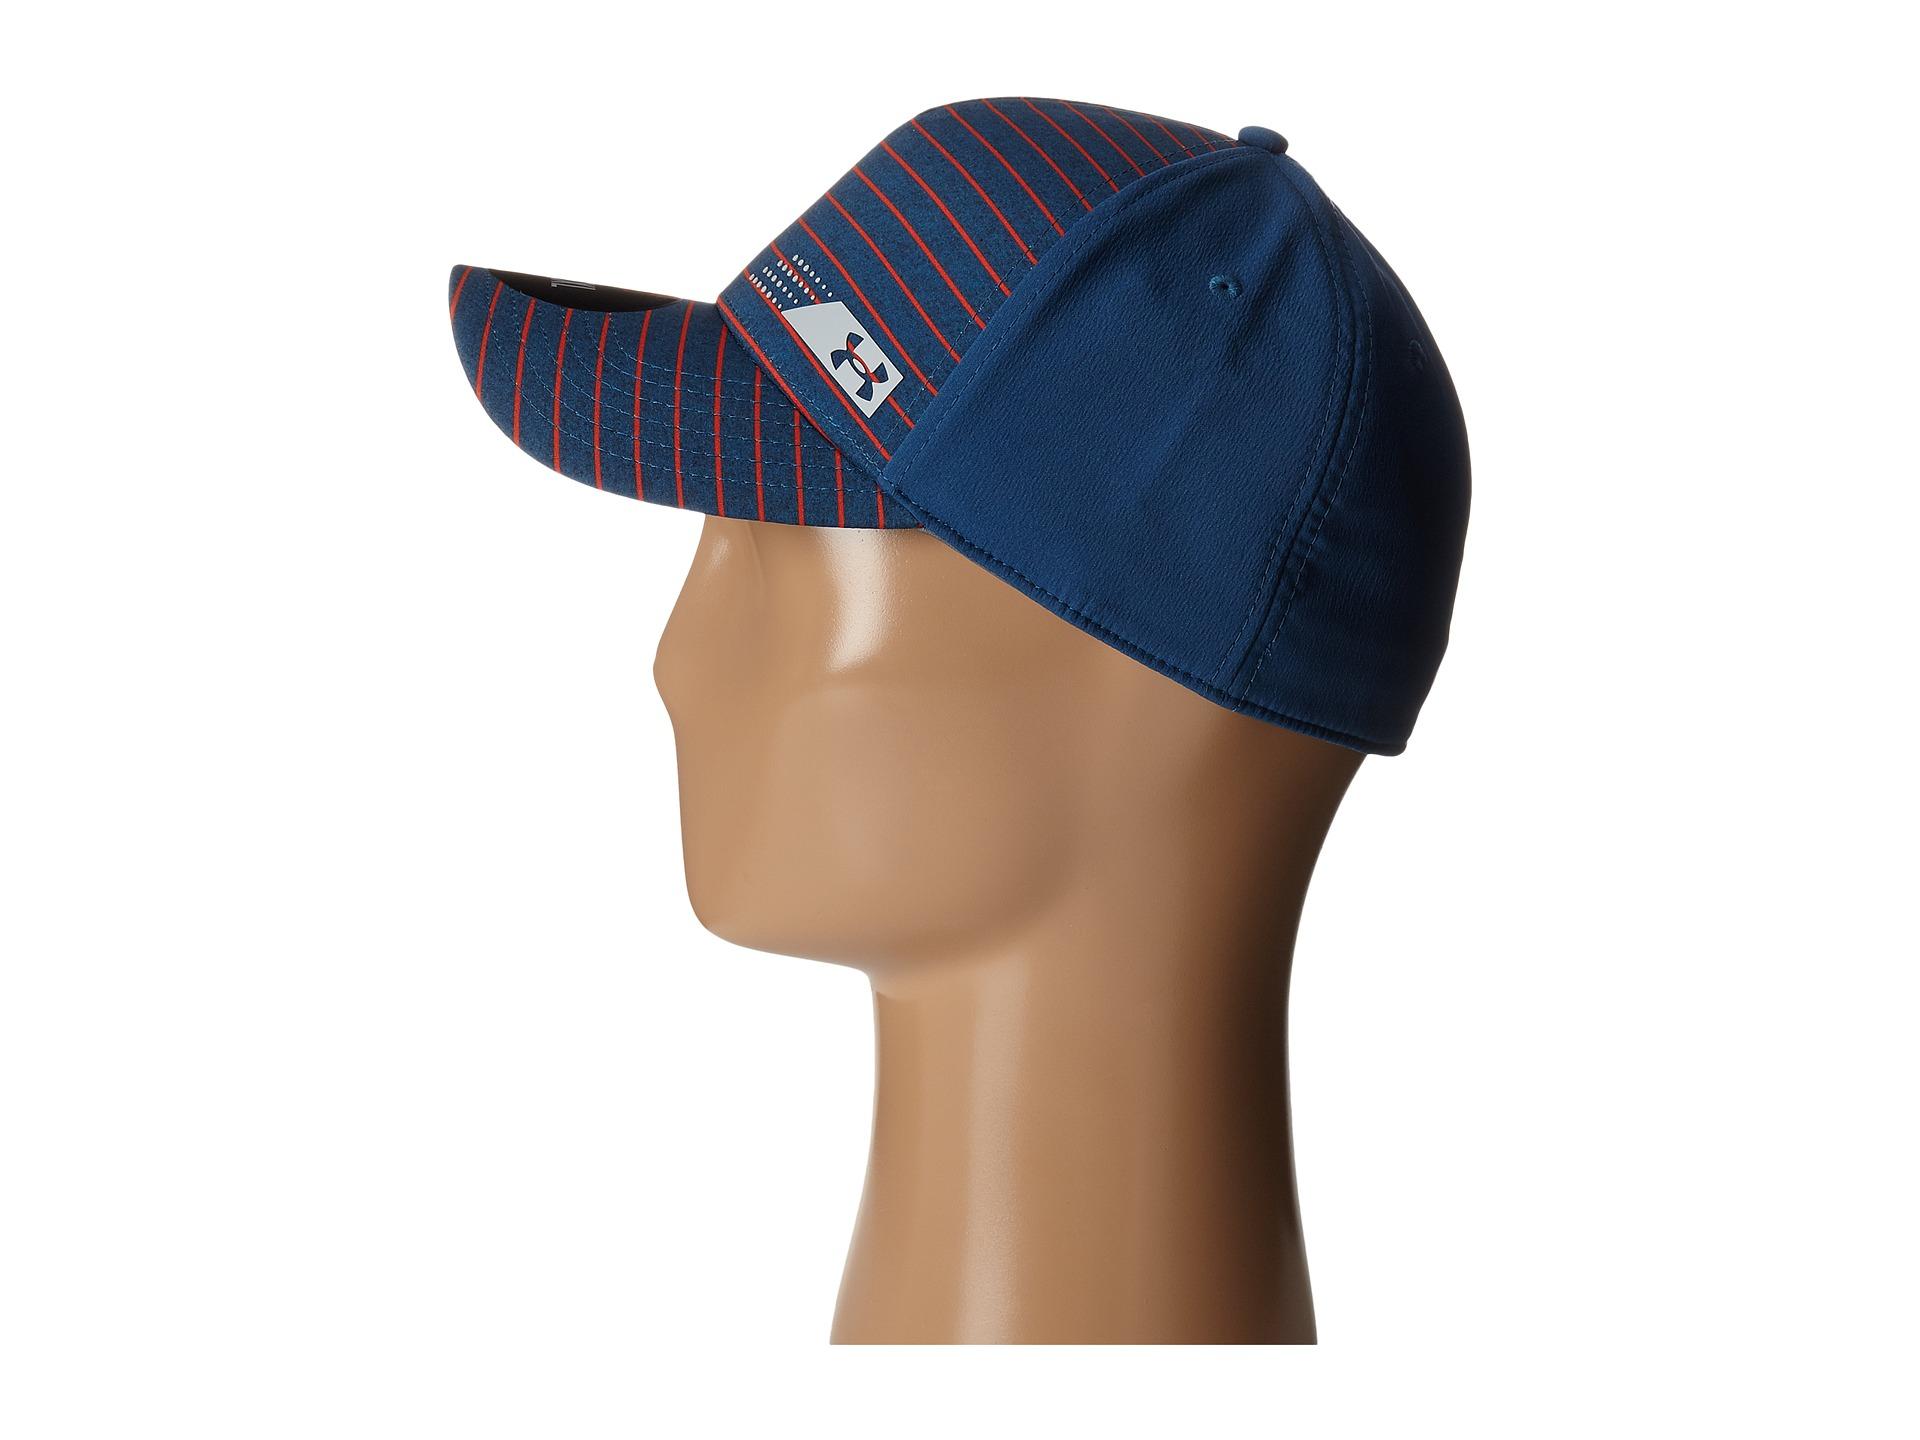 0a71b419da4 Lyst - Under Armour Ua Fairway Cap 2.0 in Blue for Men